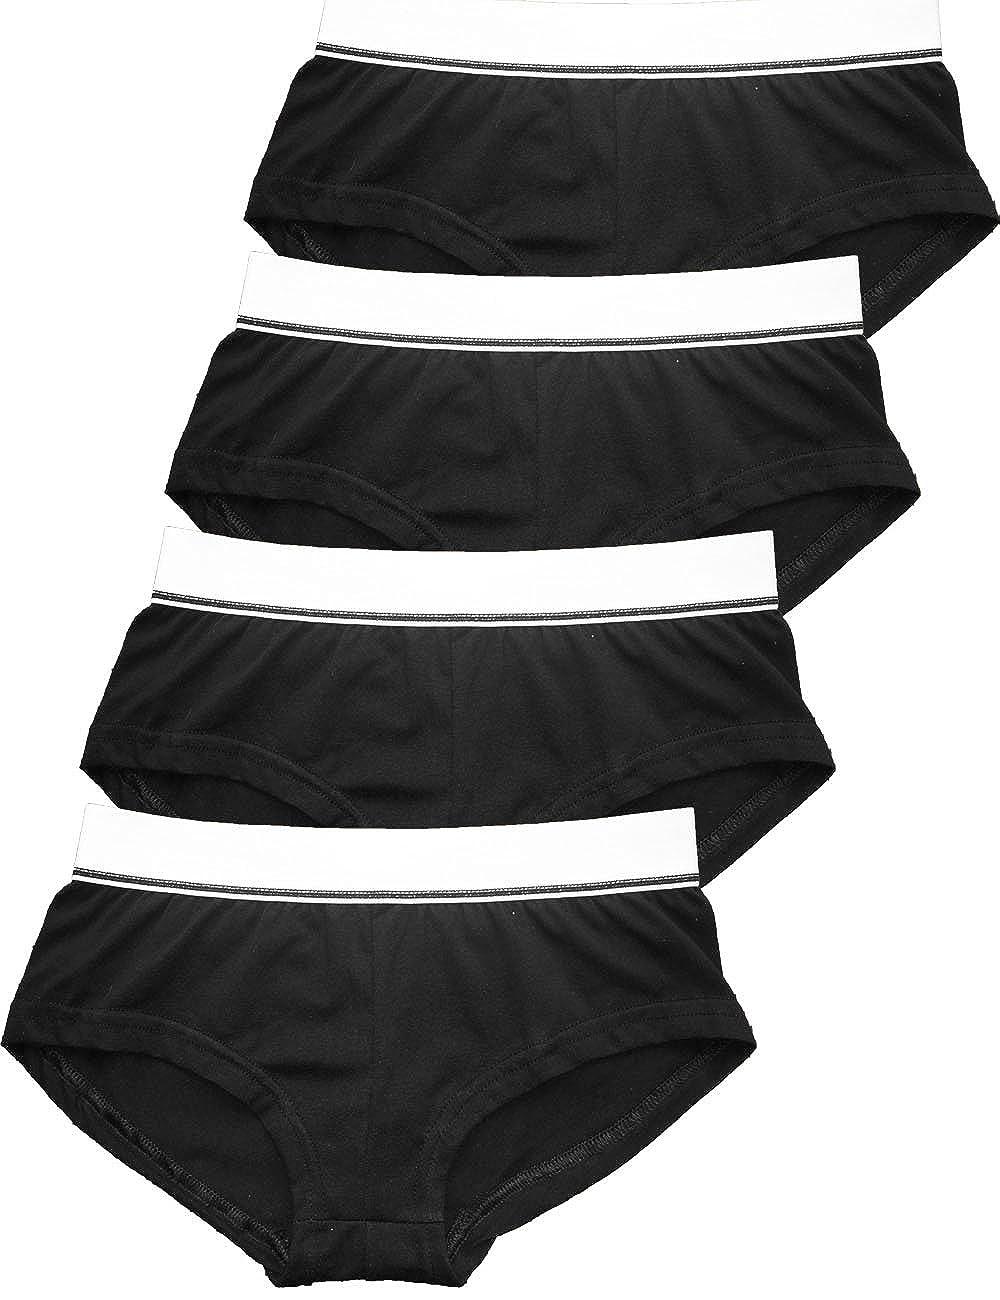 LisaModa Mädchen Panty 4er Pack Stretch Baumwolle